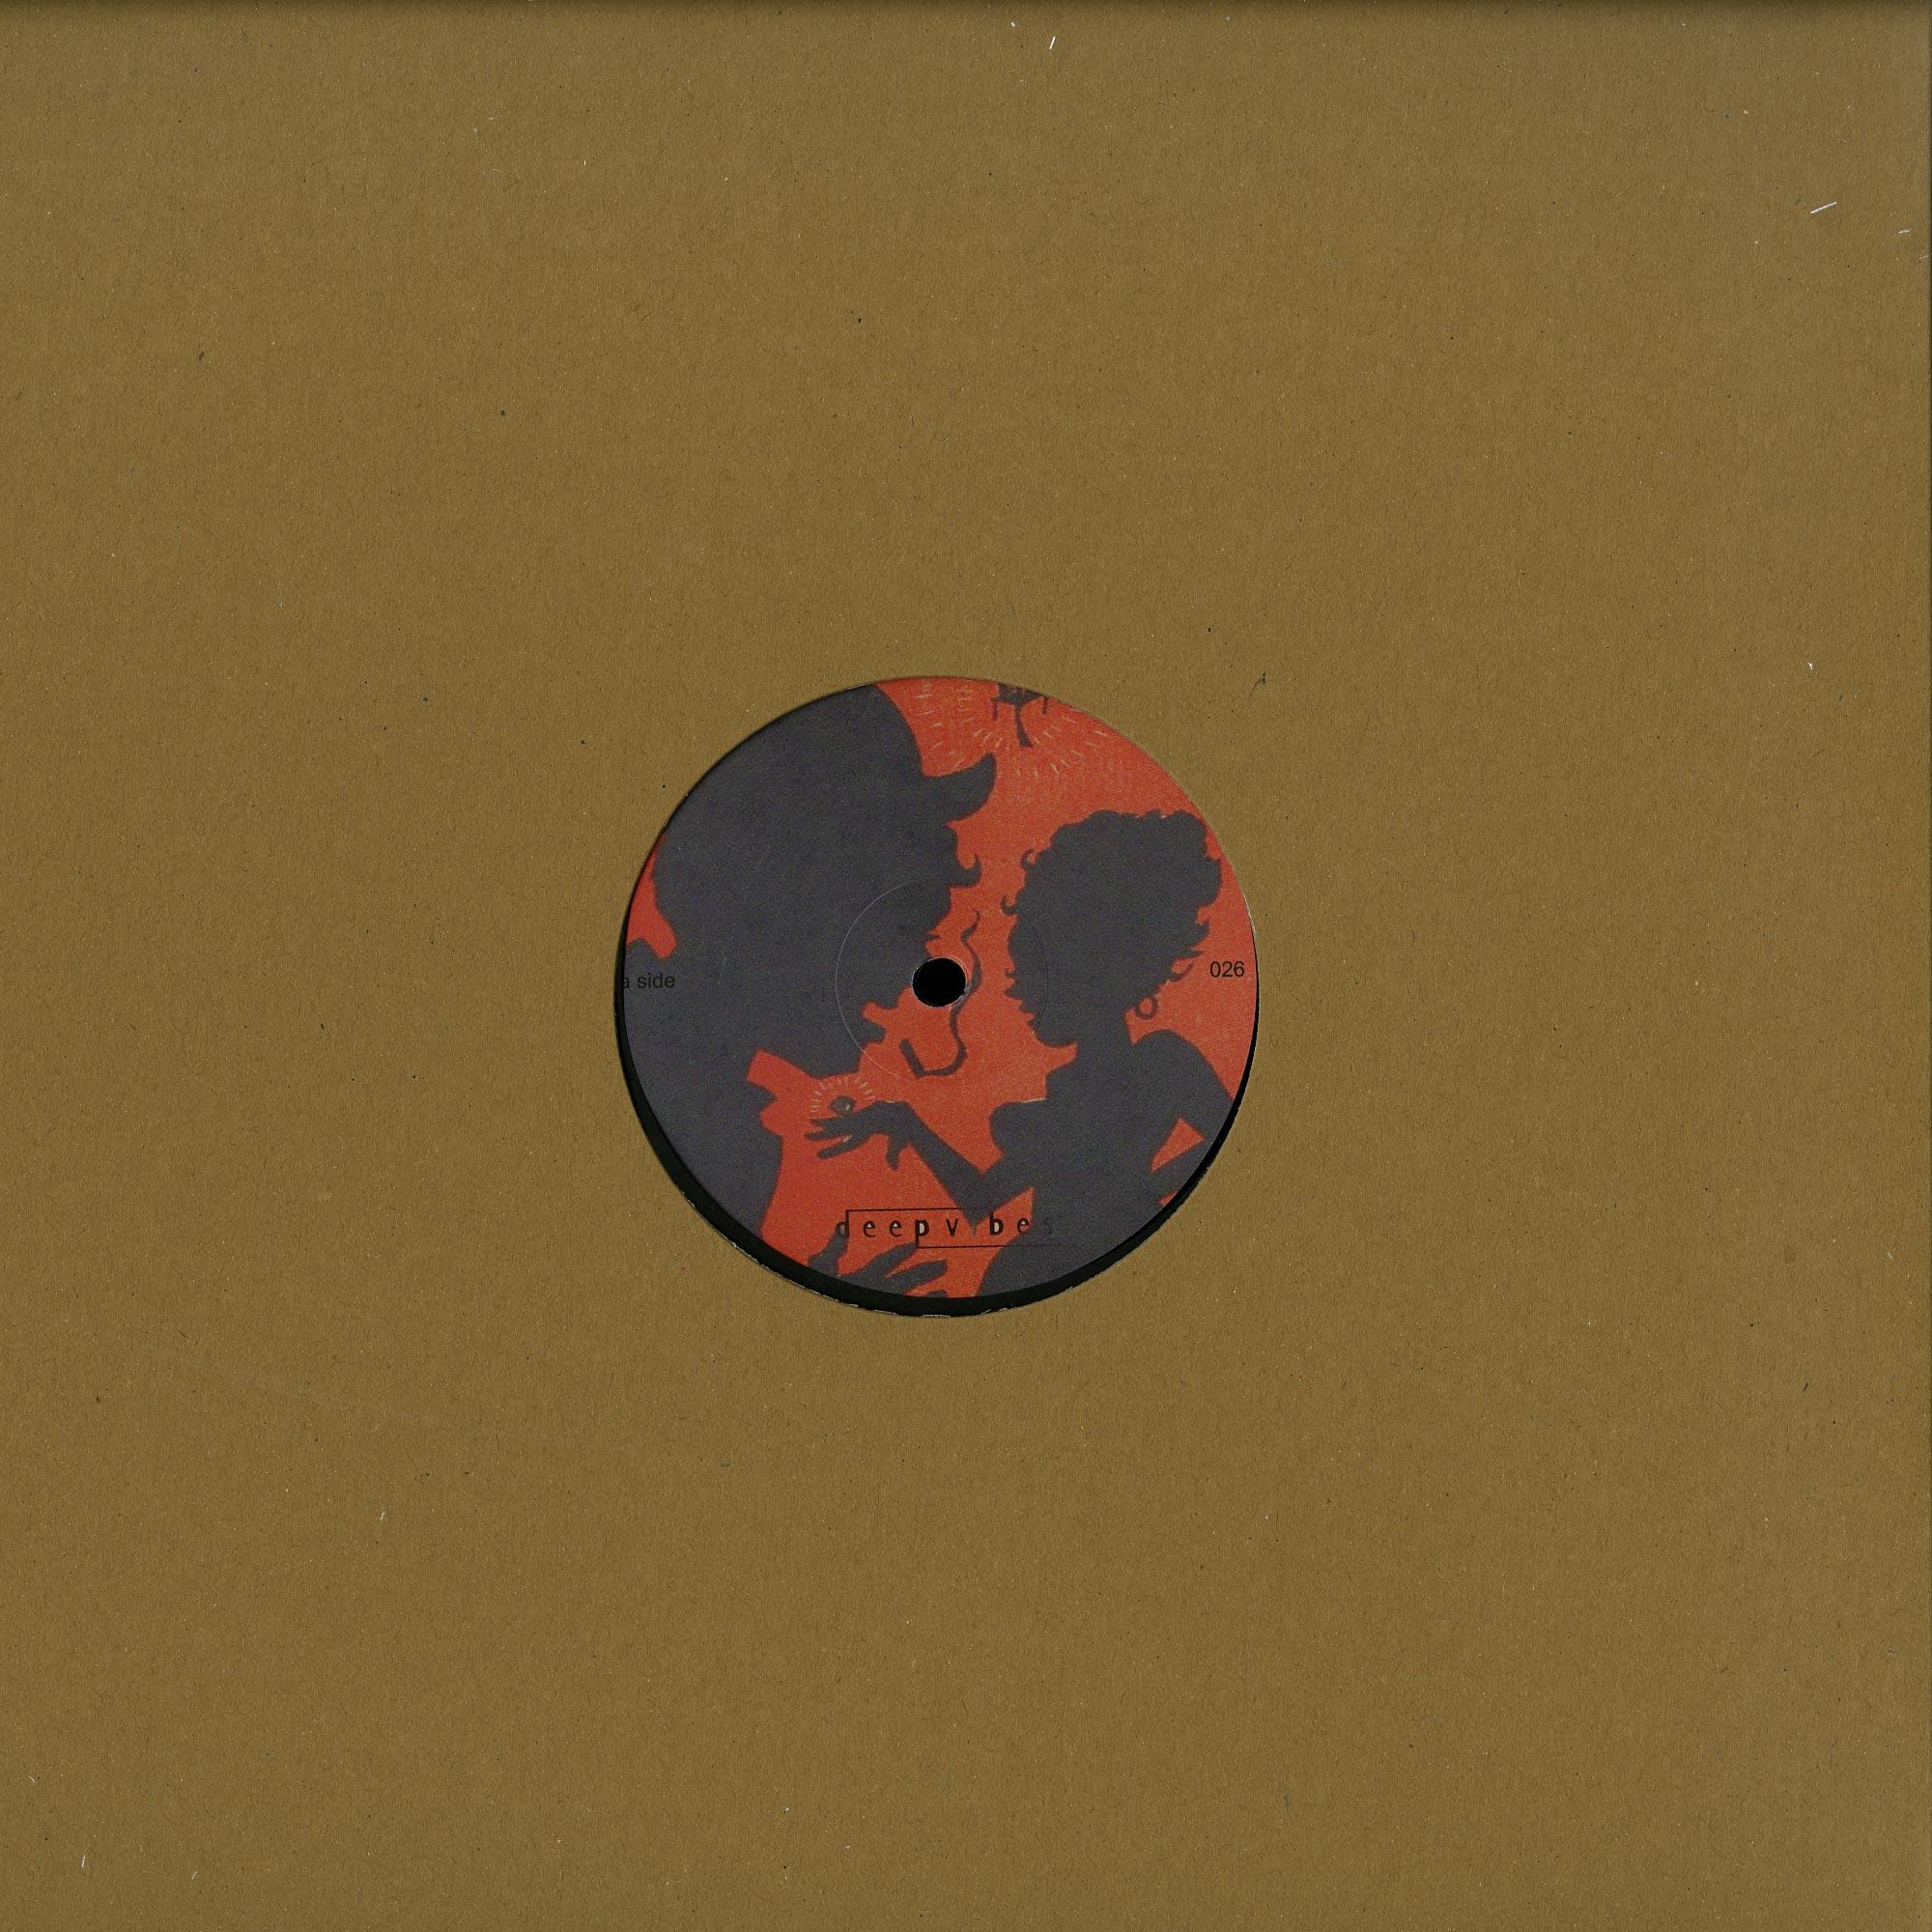 Sascha Dive, Silicone Soul, Roland Clark - THE LOST REMIXES EP